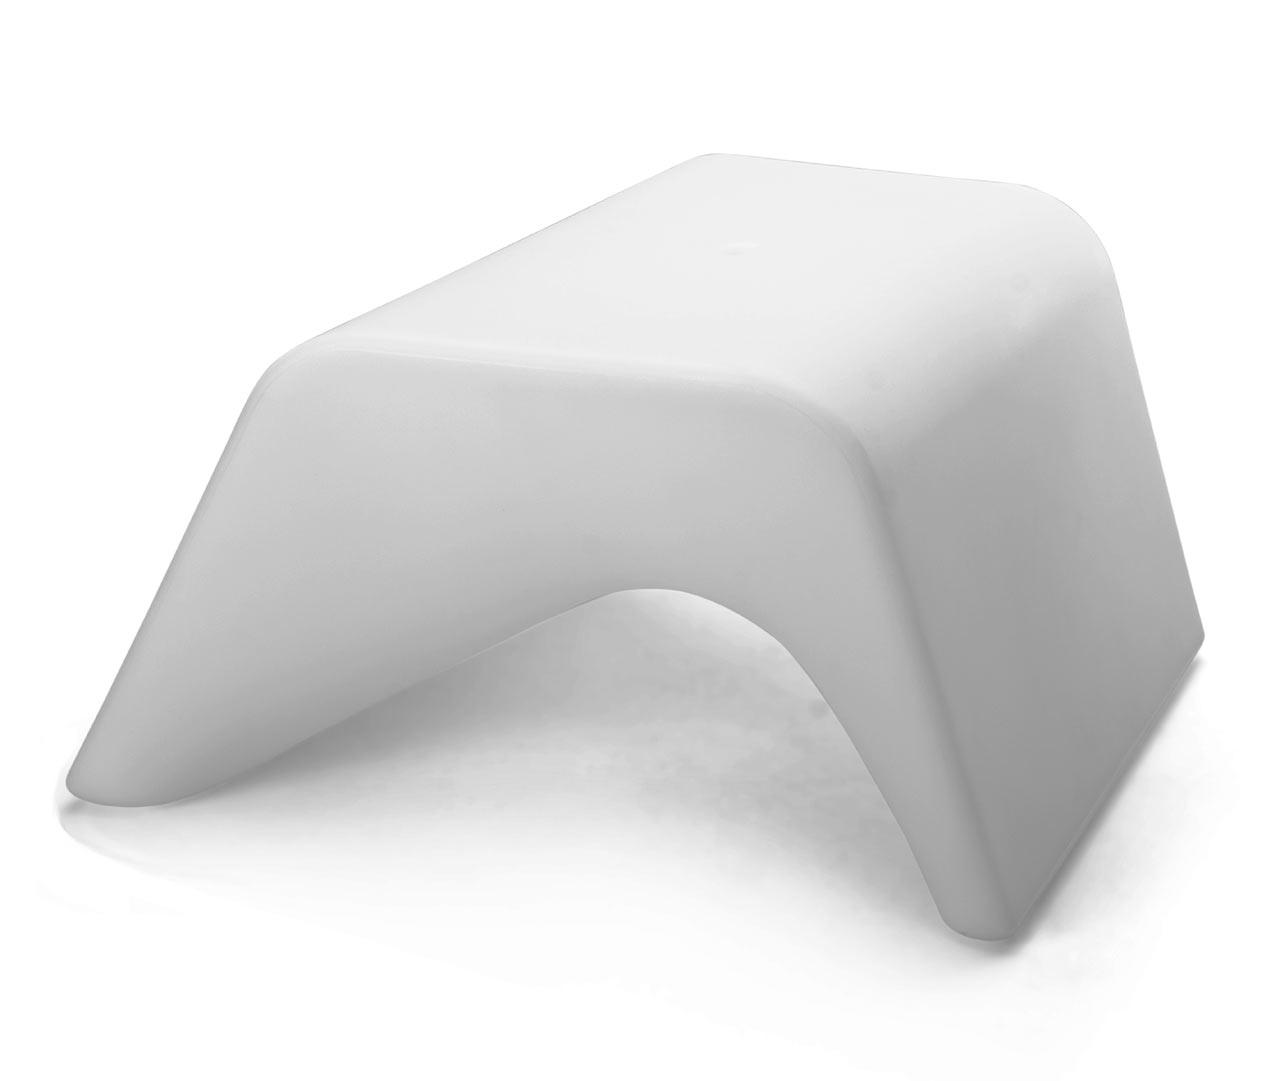 Offi-Otto-Bench-Planter-Lisa-Albin-11-white